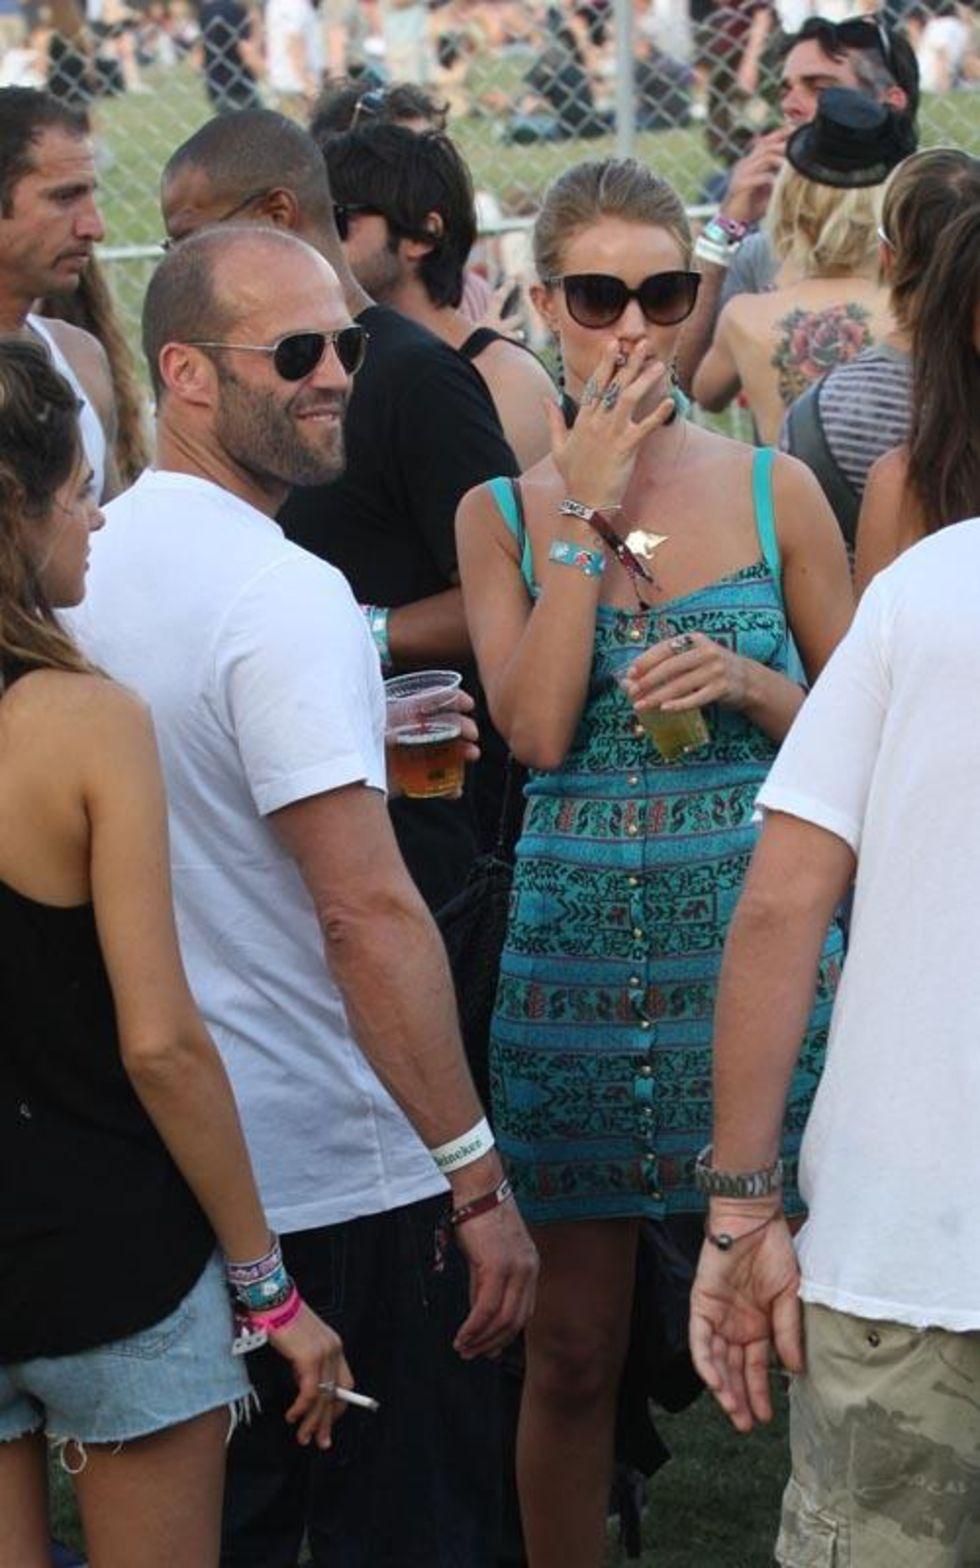 Jason Statham Kristin Cavallari Hook Up